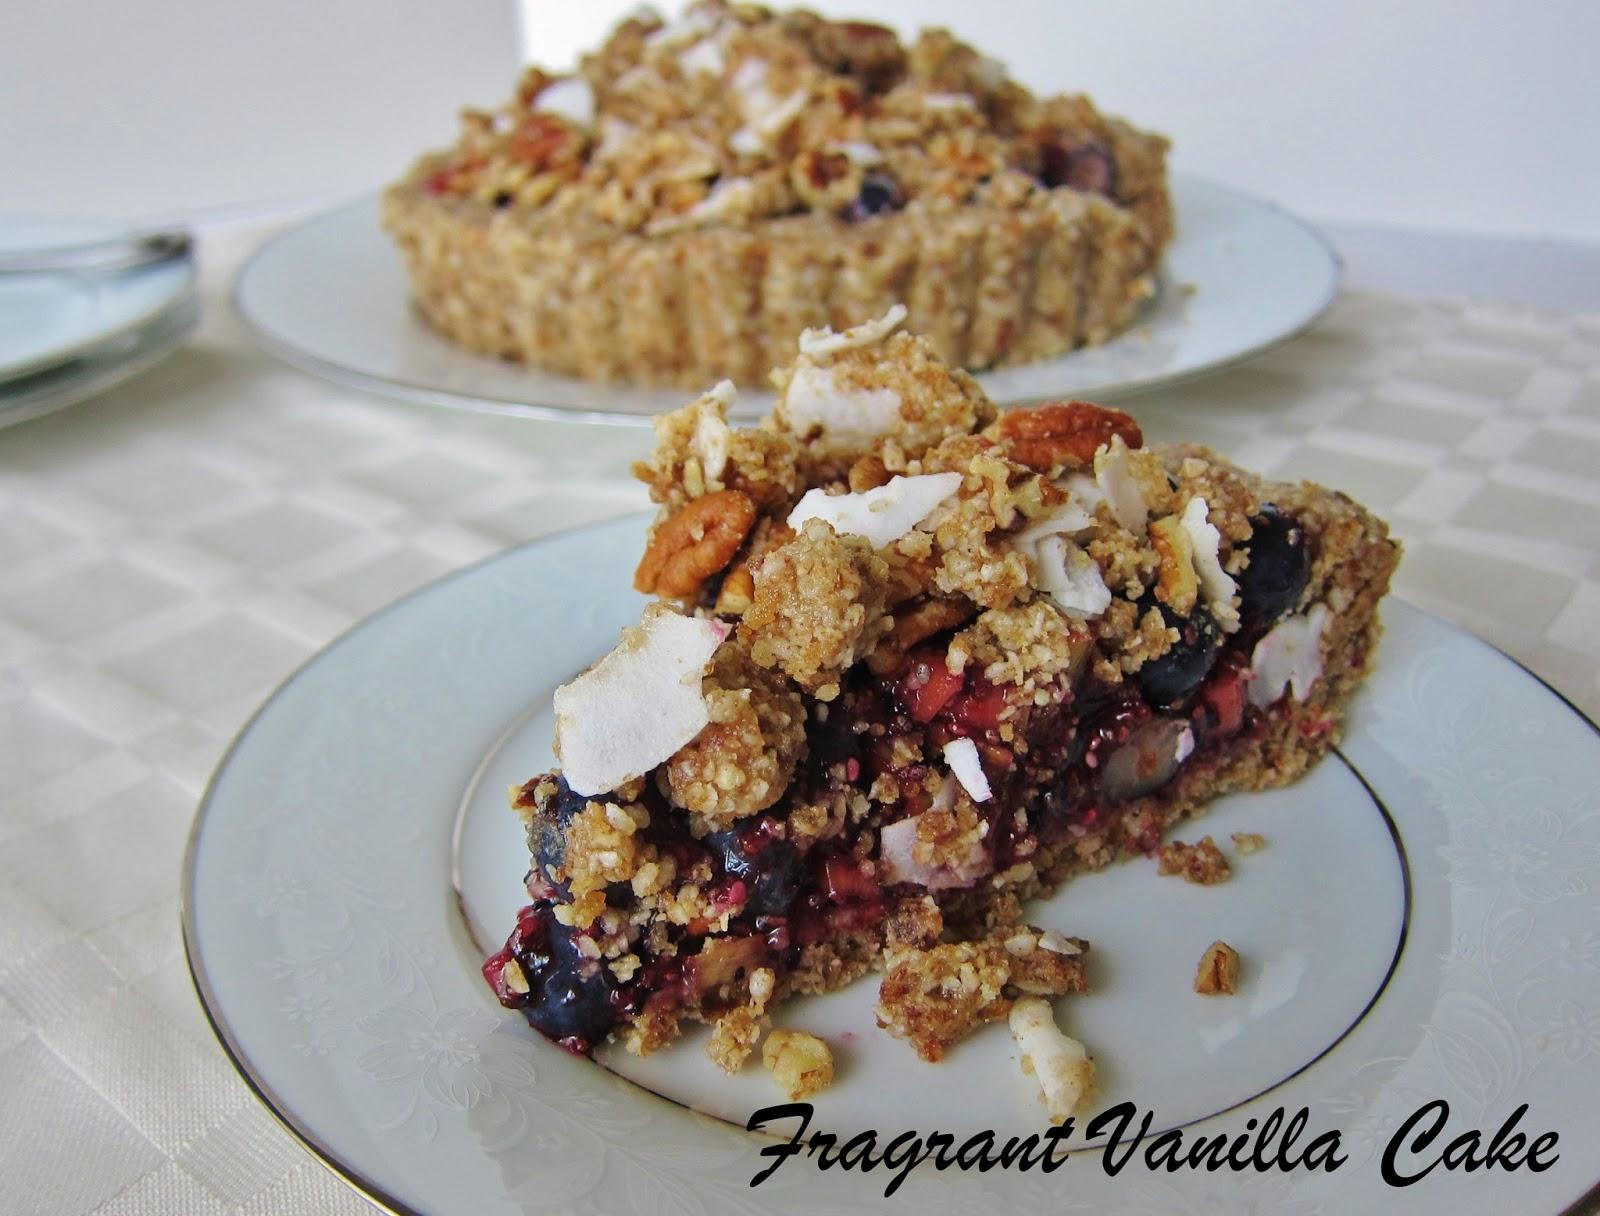 Blueberry Rhubarb Ginger Crumble Tart | Fragrant Vanilla Cake